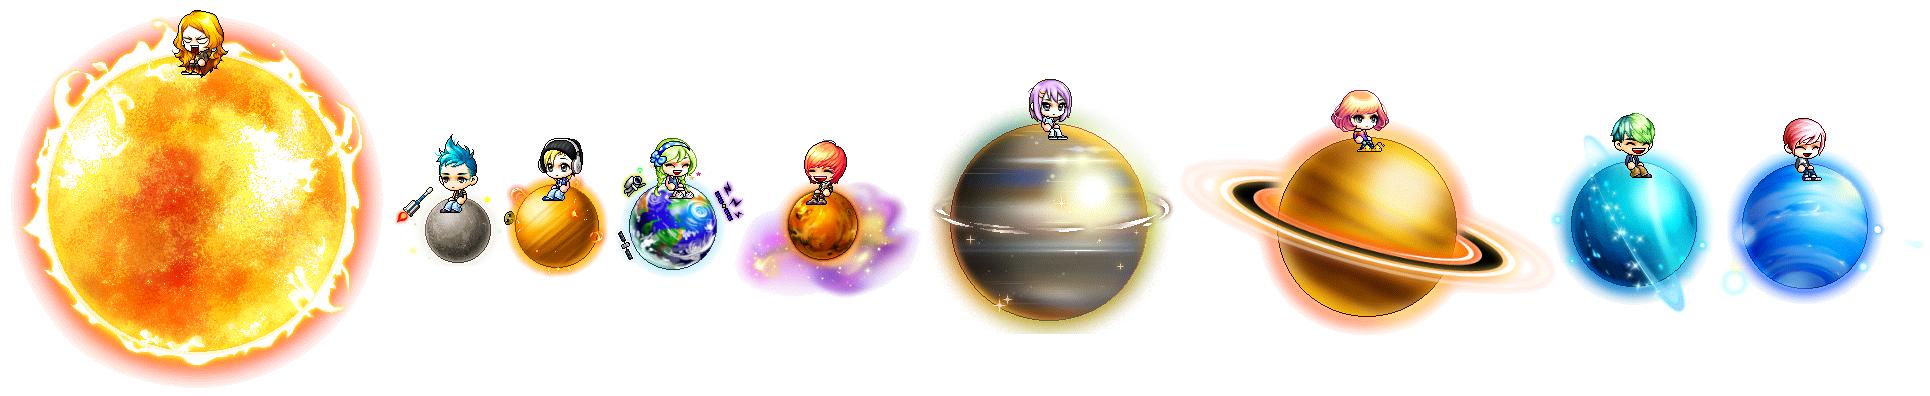 maplestory bubbling